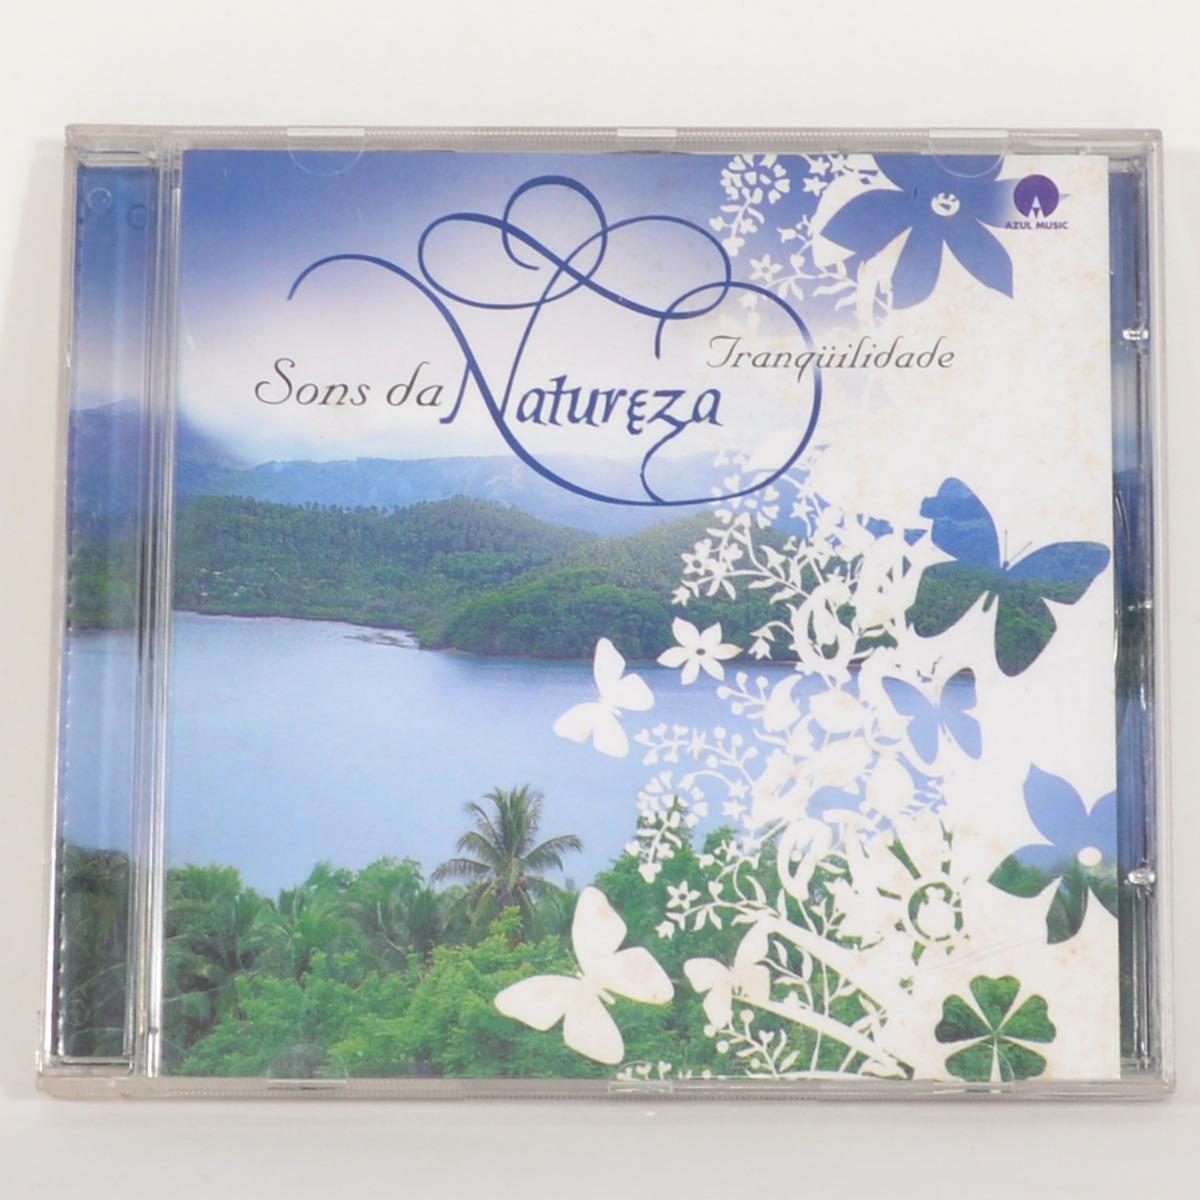 gratis sons da natureza - tranquilidade